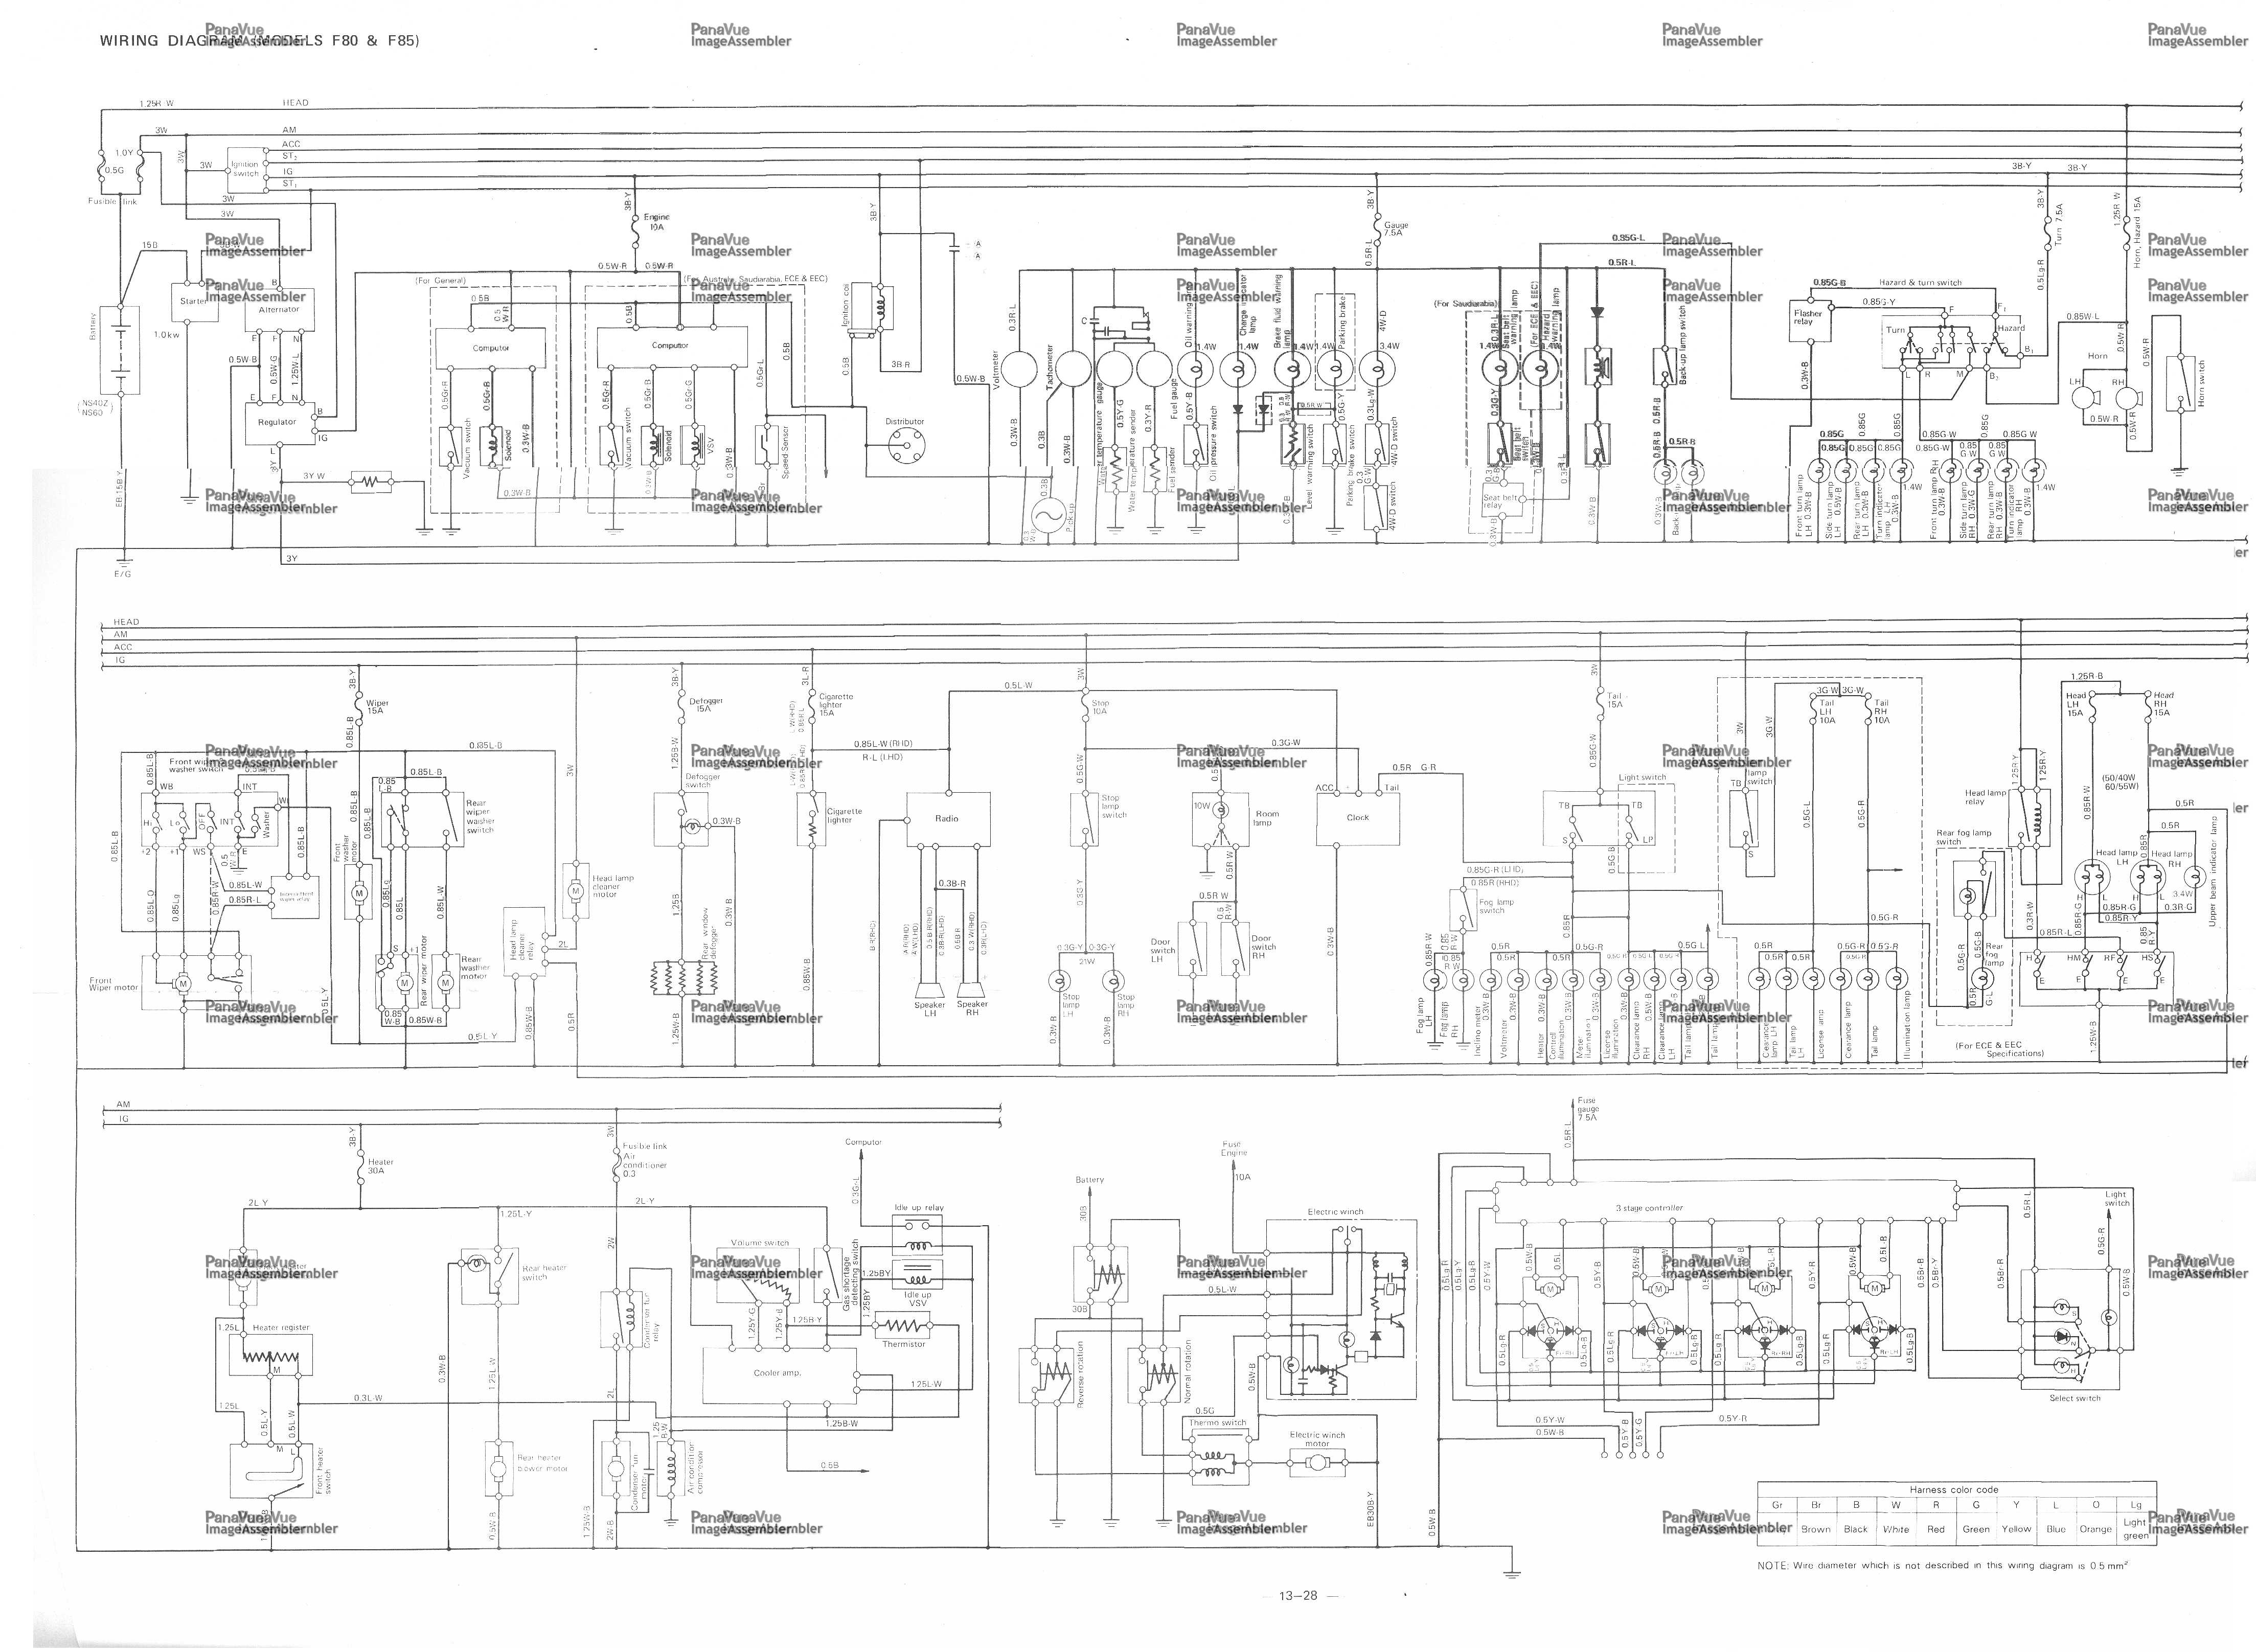 daihatsu l7 wiring diagram wiring info u2022 rh datagrind co Daihatsu Mira MCM Daihatsu Hijet